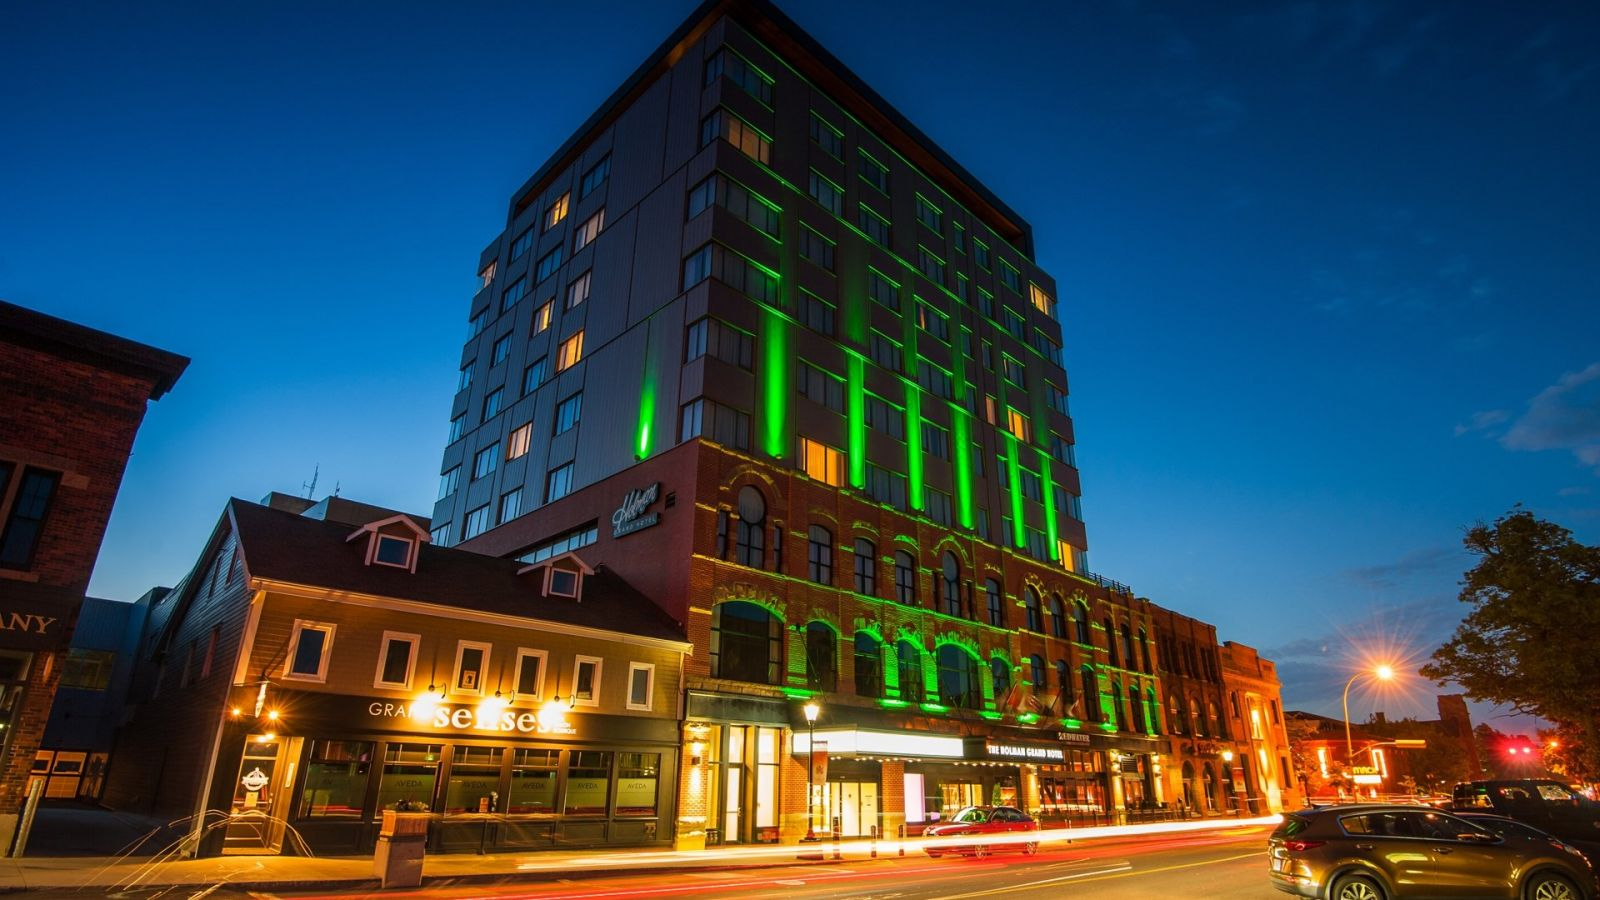 The Holman Grand Hotel Charlottetown - exterior image